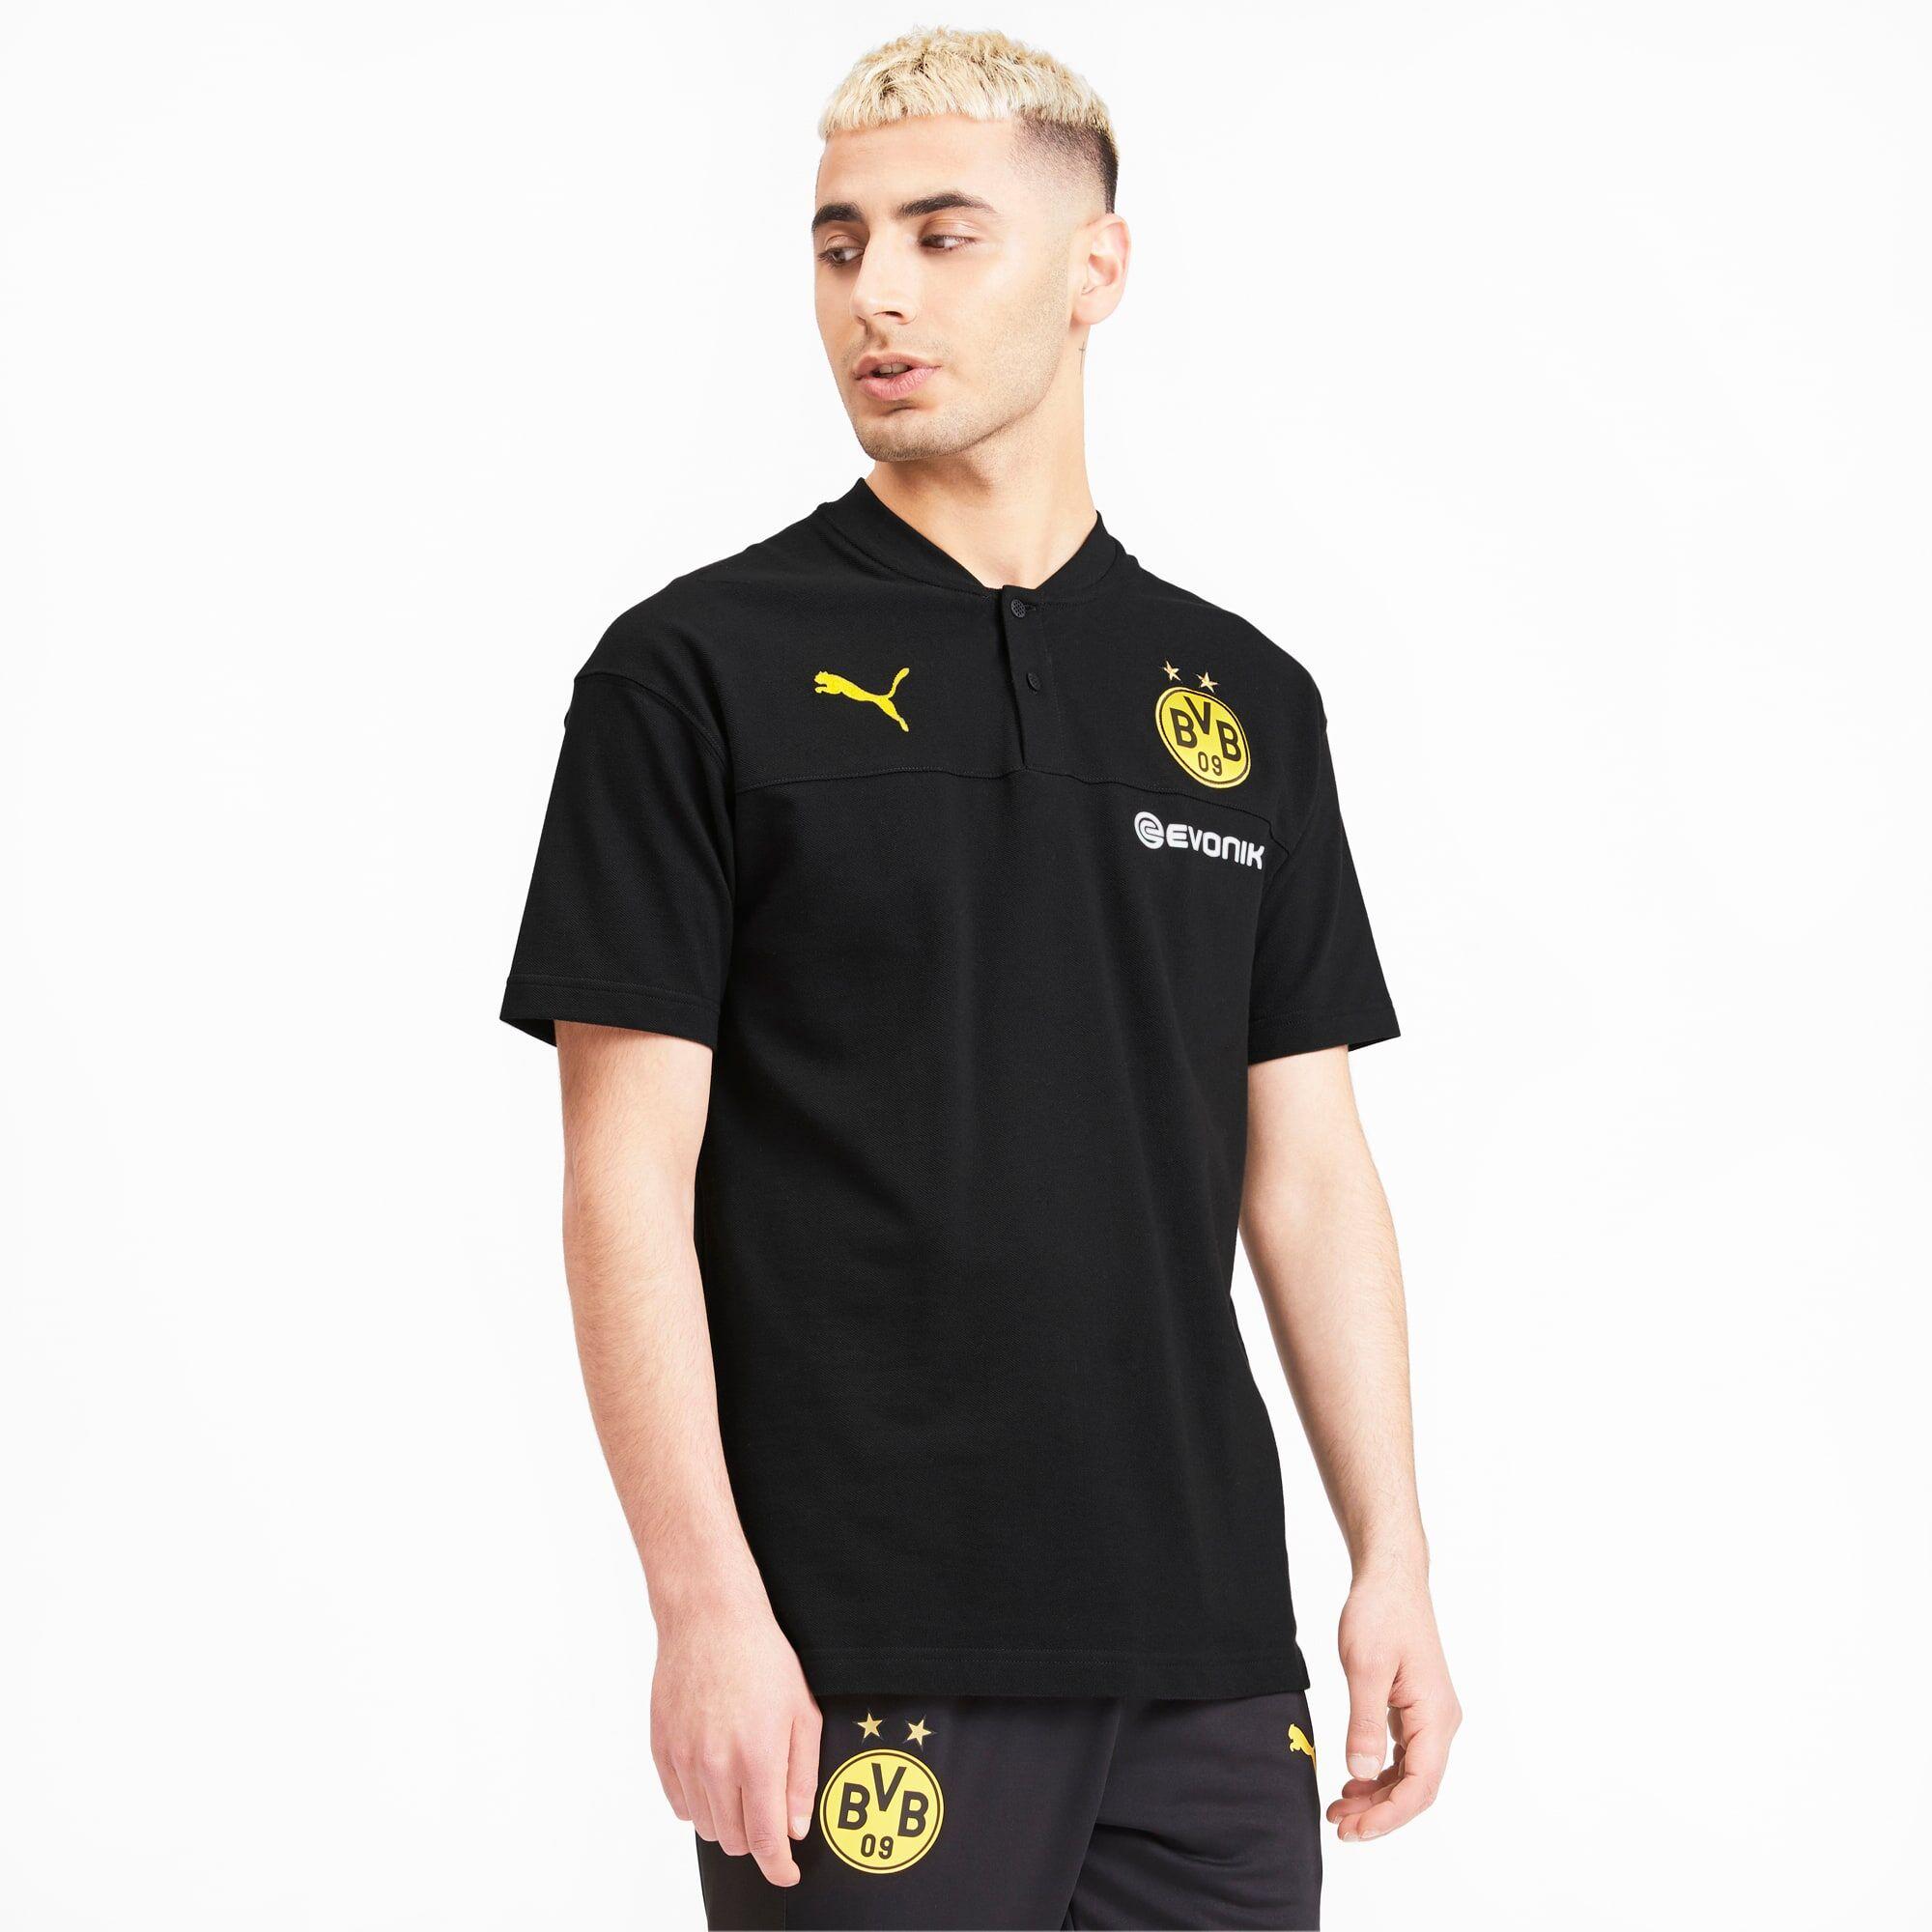 Puma BVB Casuals Men's Polo Shirt,  Black/Phantom Black, size Large, Clothing